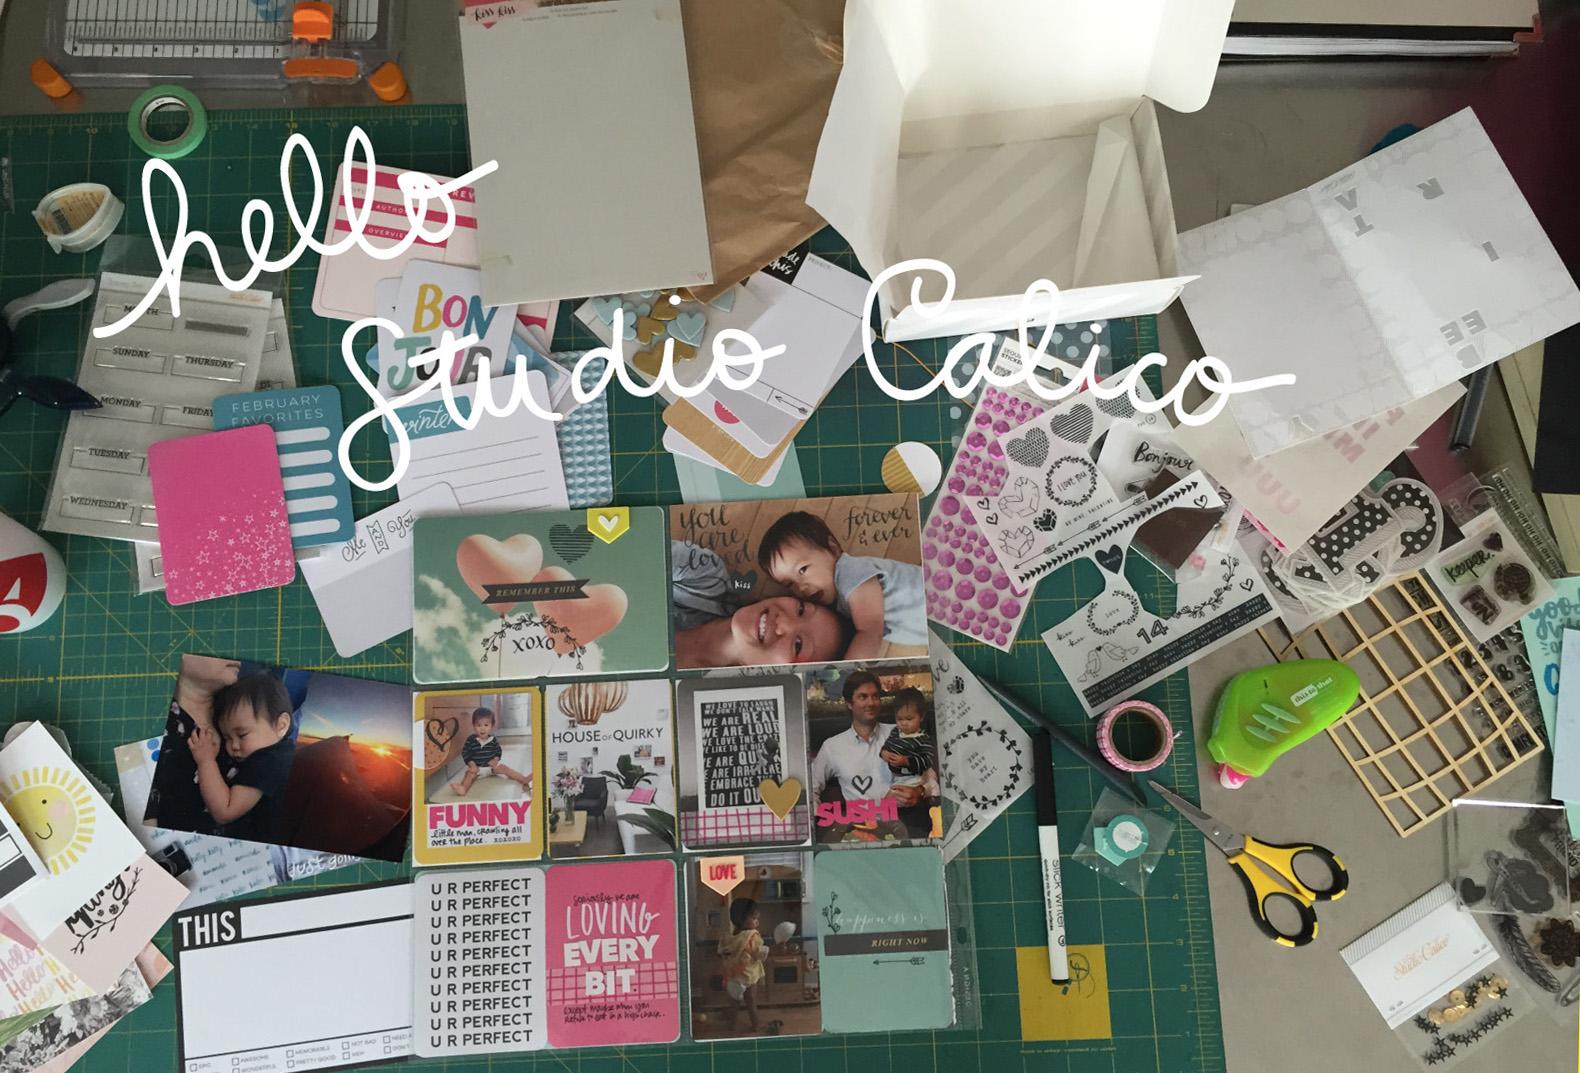 Amy Tangerine's desk